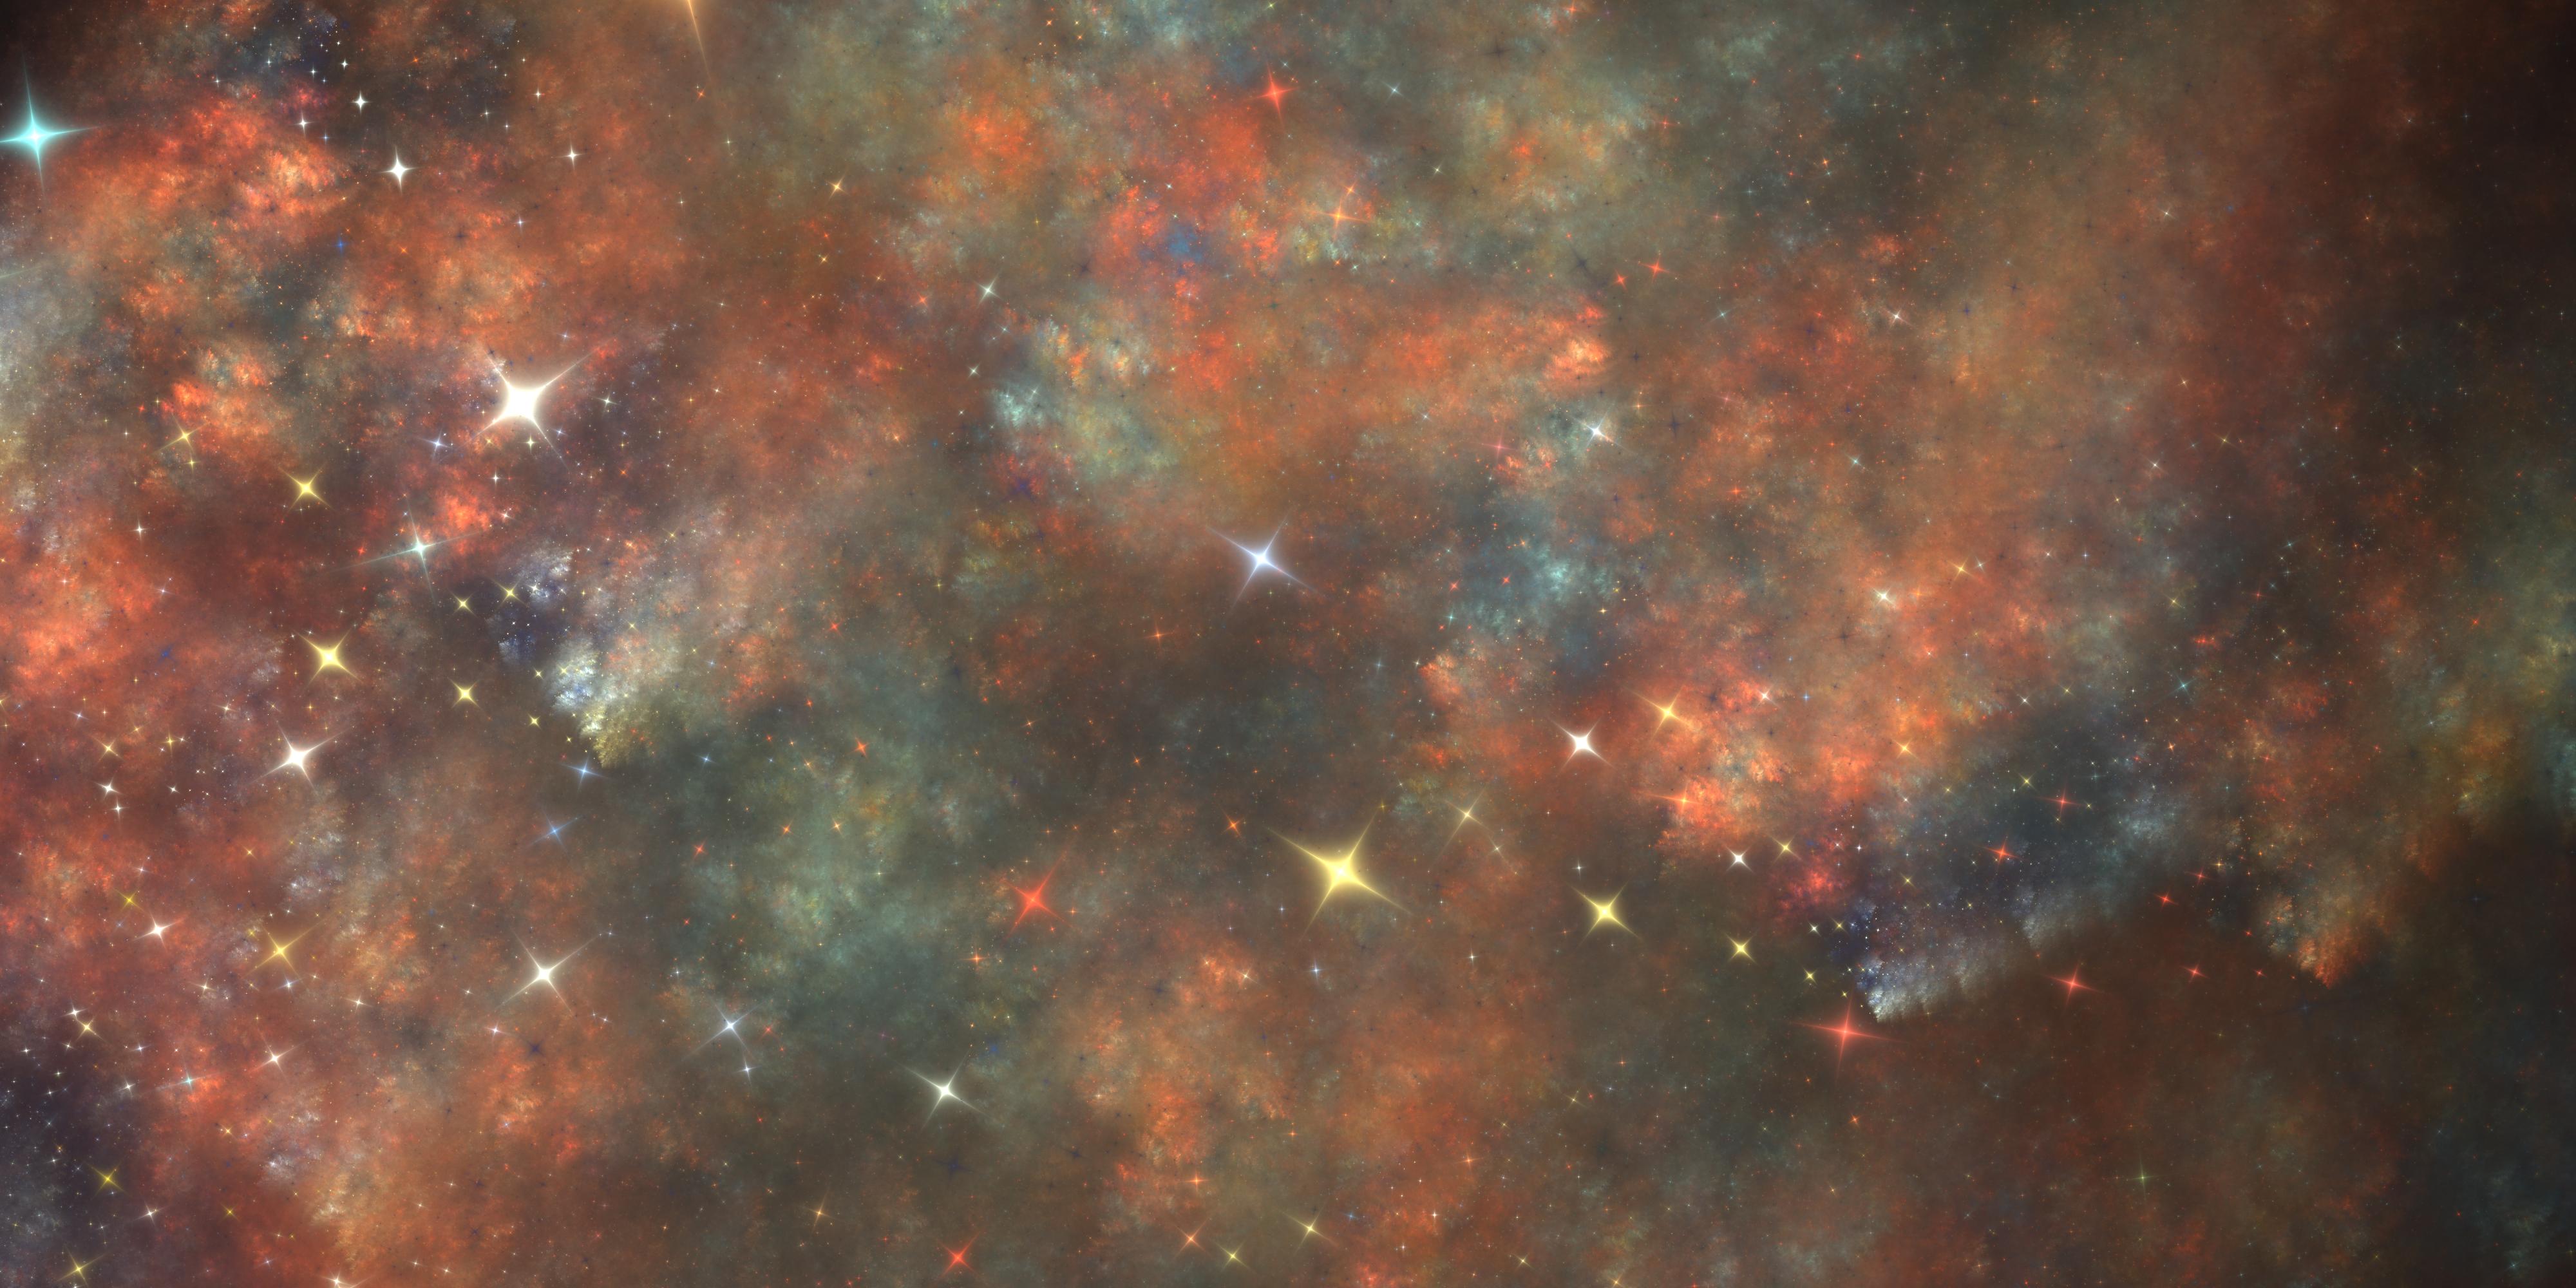 Nebula by RationalParadox